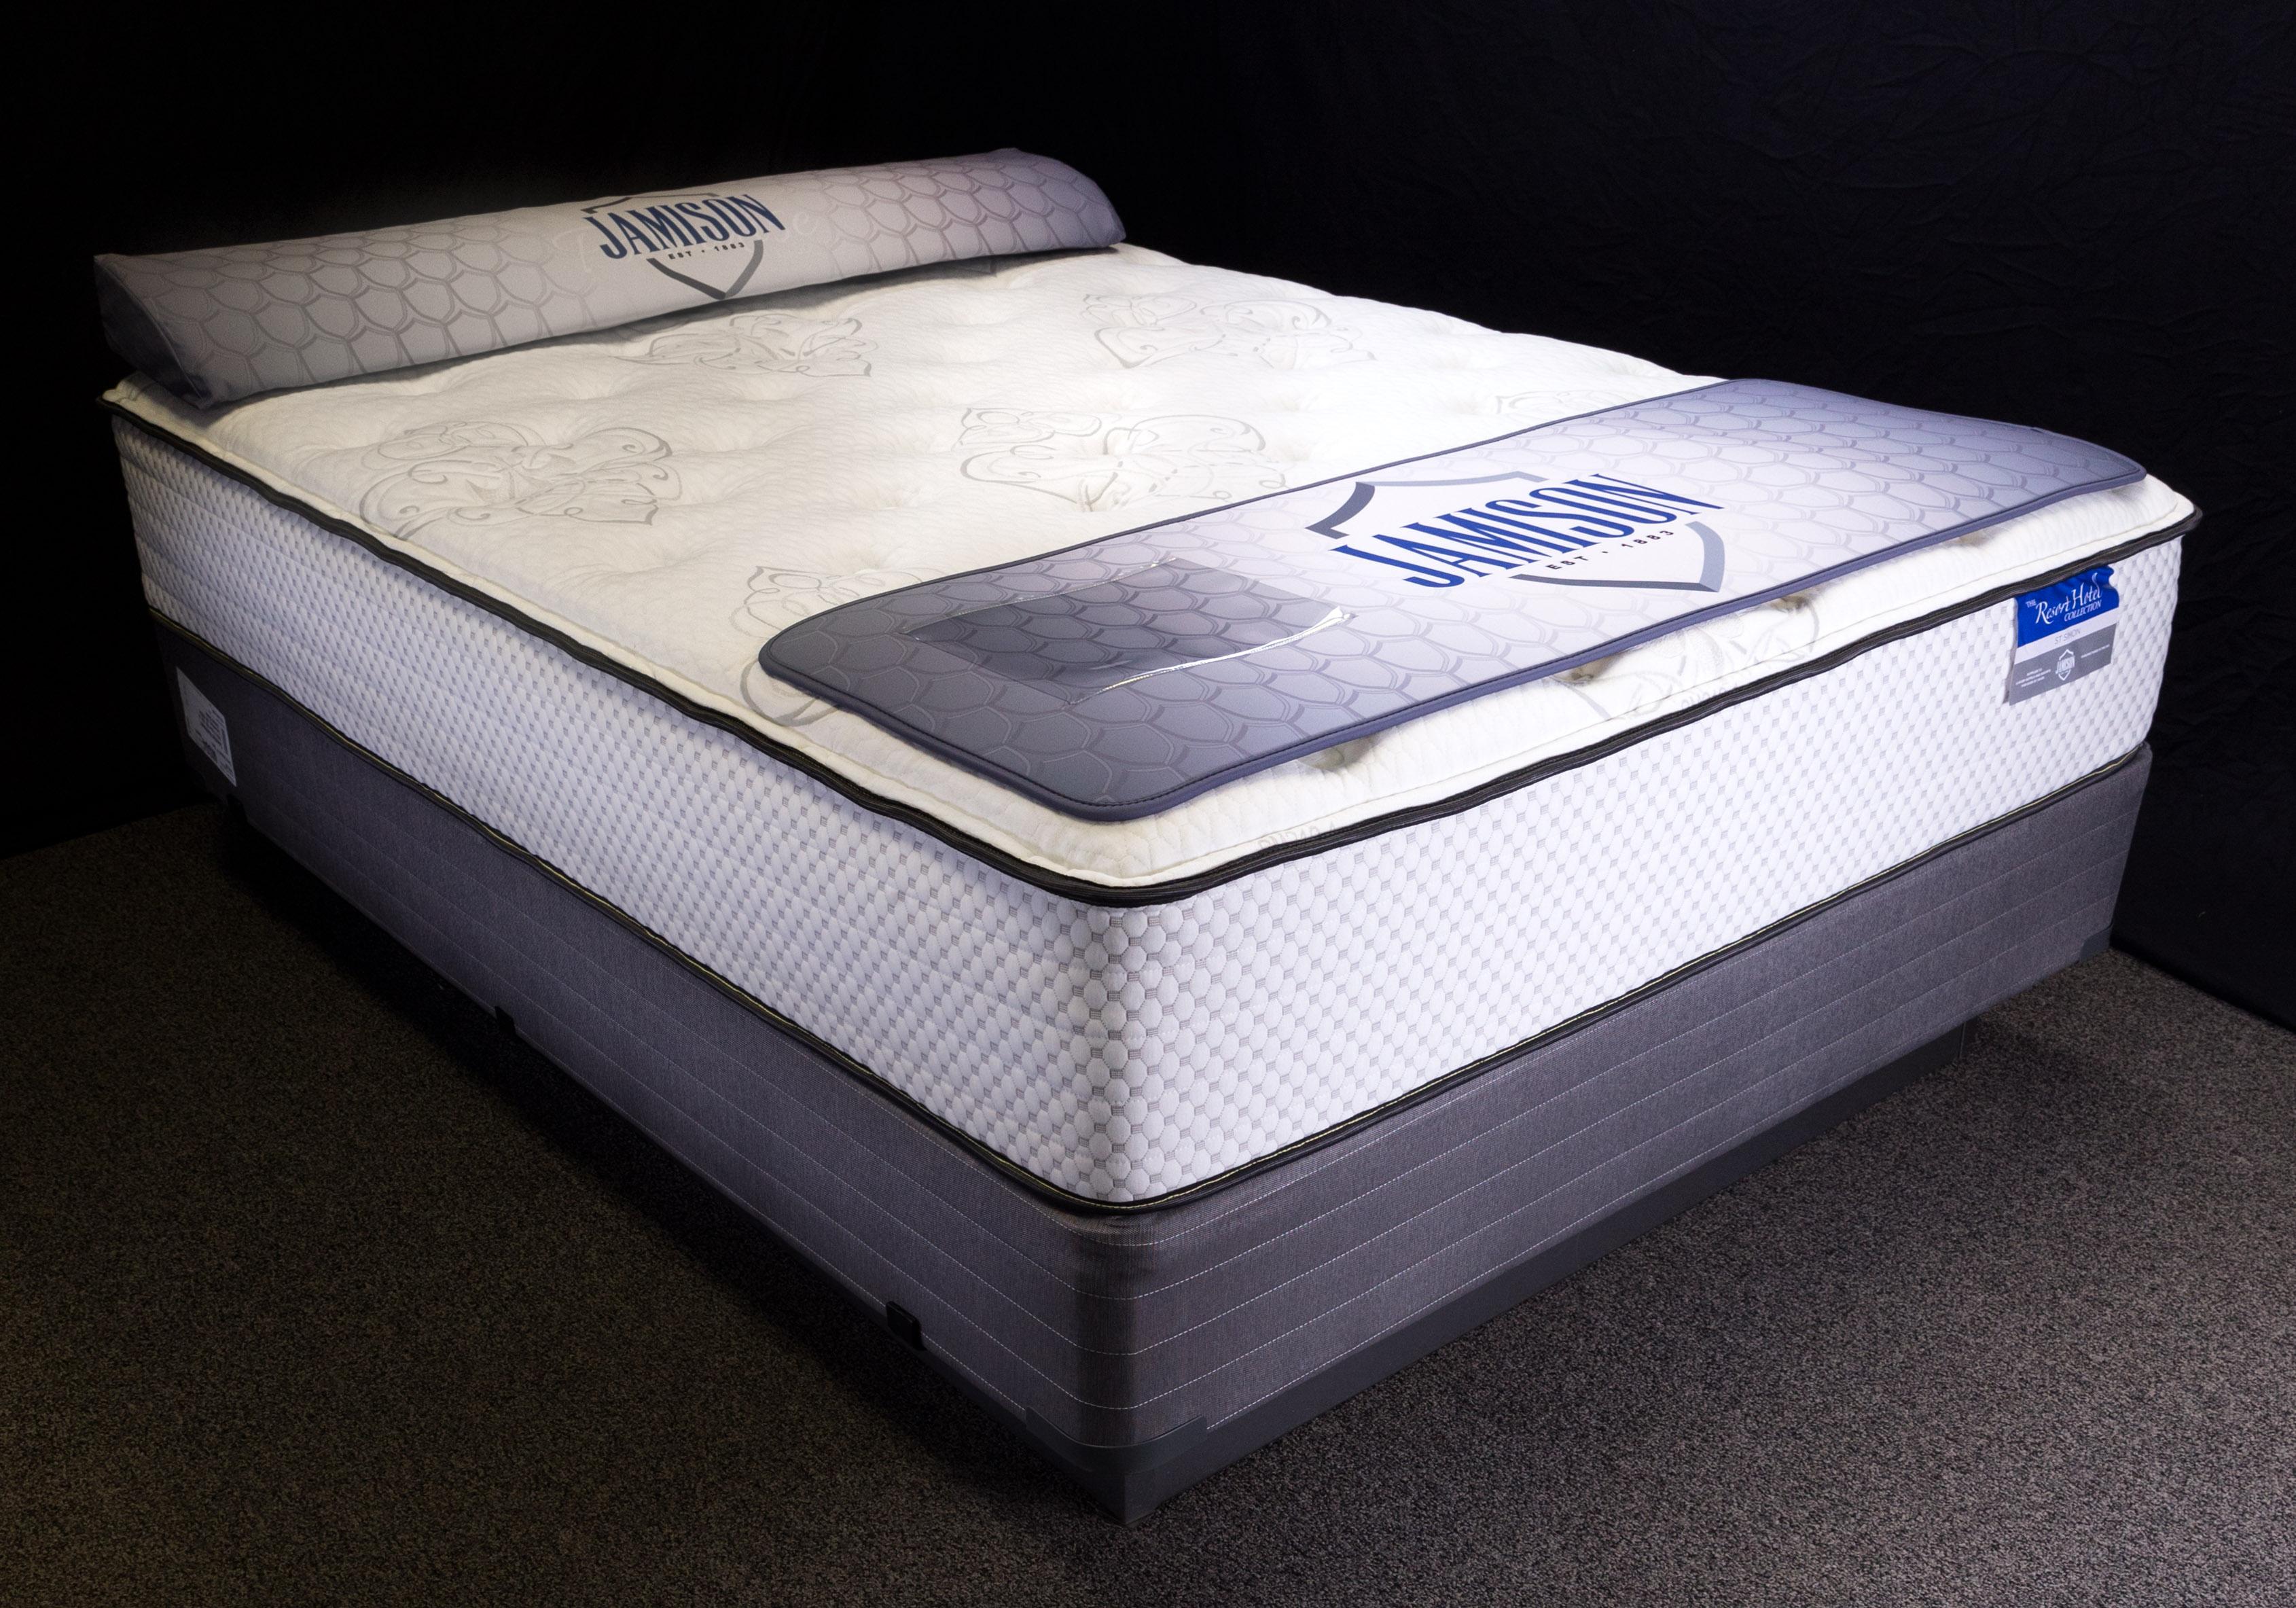 good morning mattress center perfect mattress perfect price